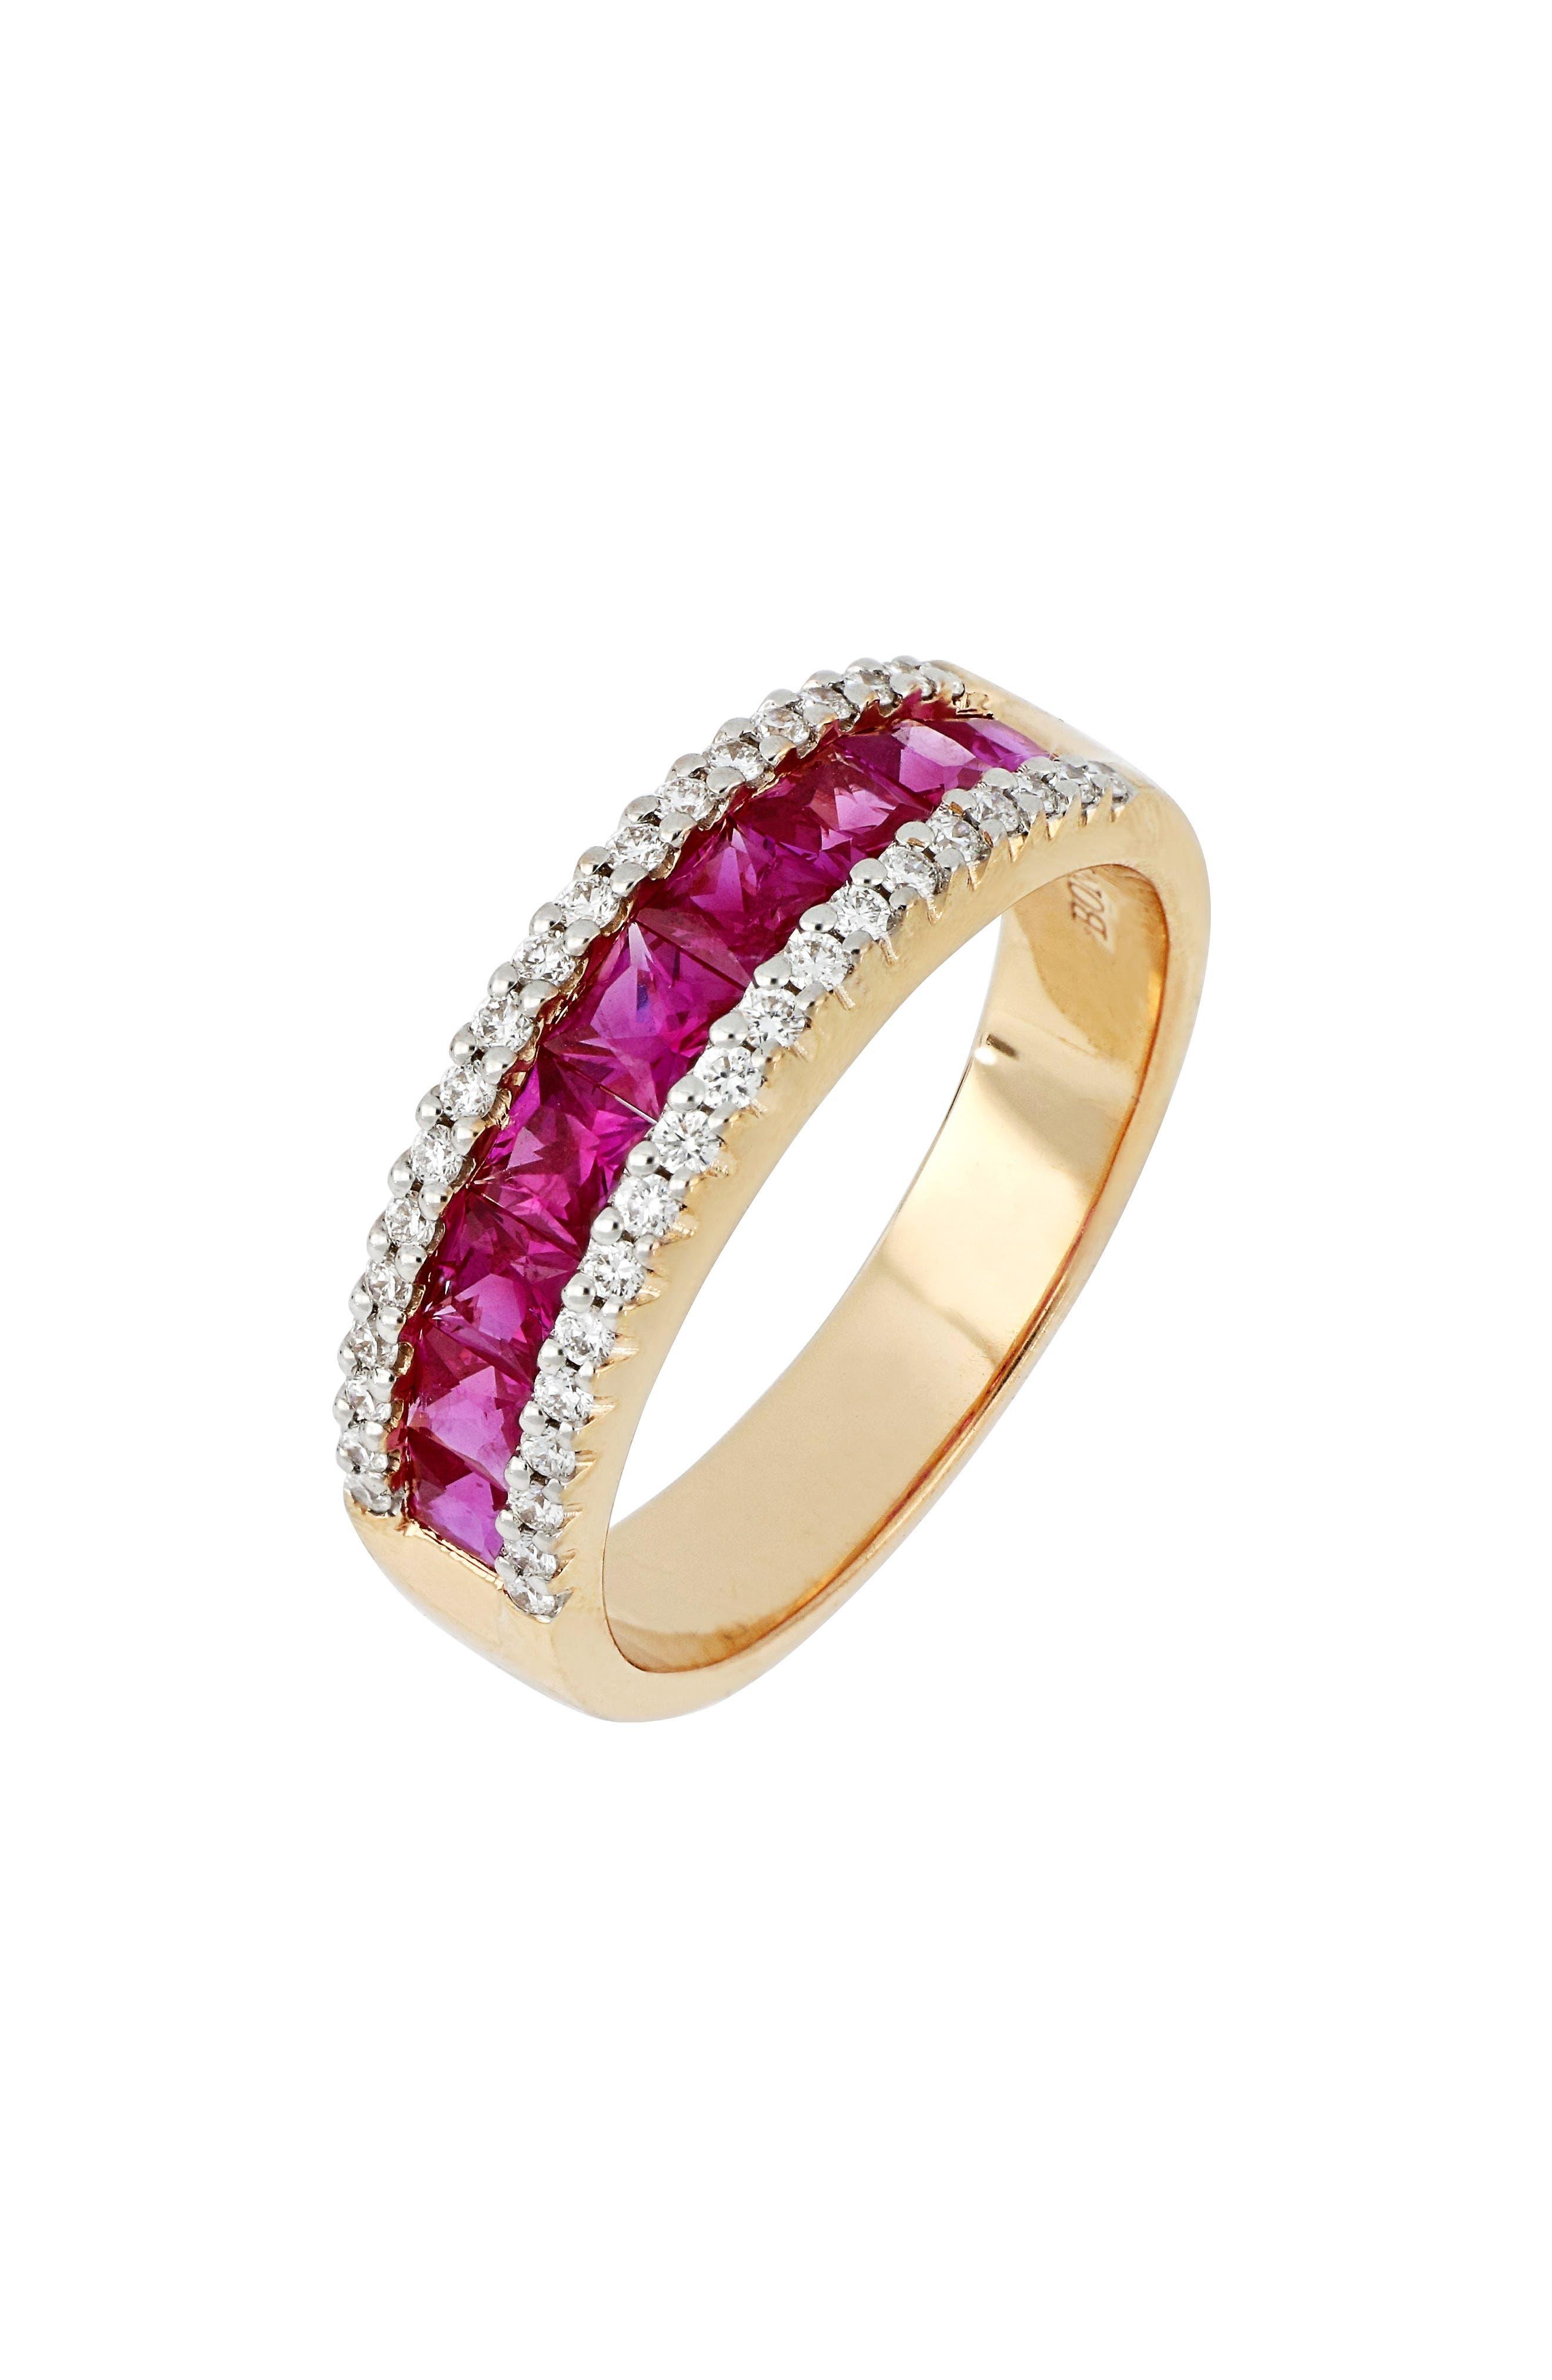 Diamond & Ruby Band Ring,                             Main thumbnail 1, color,                             ROSE GOLD/ RUBY